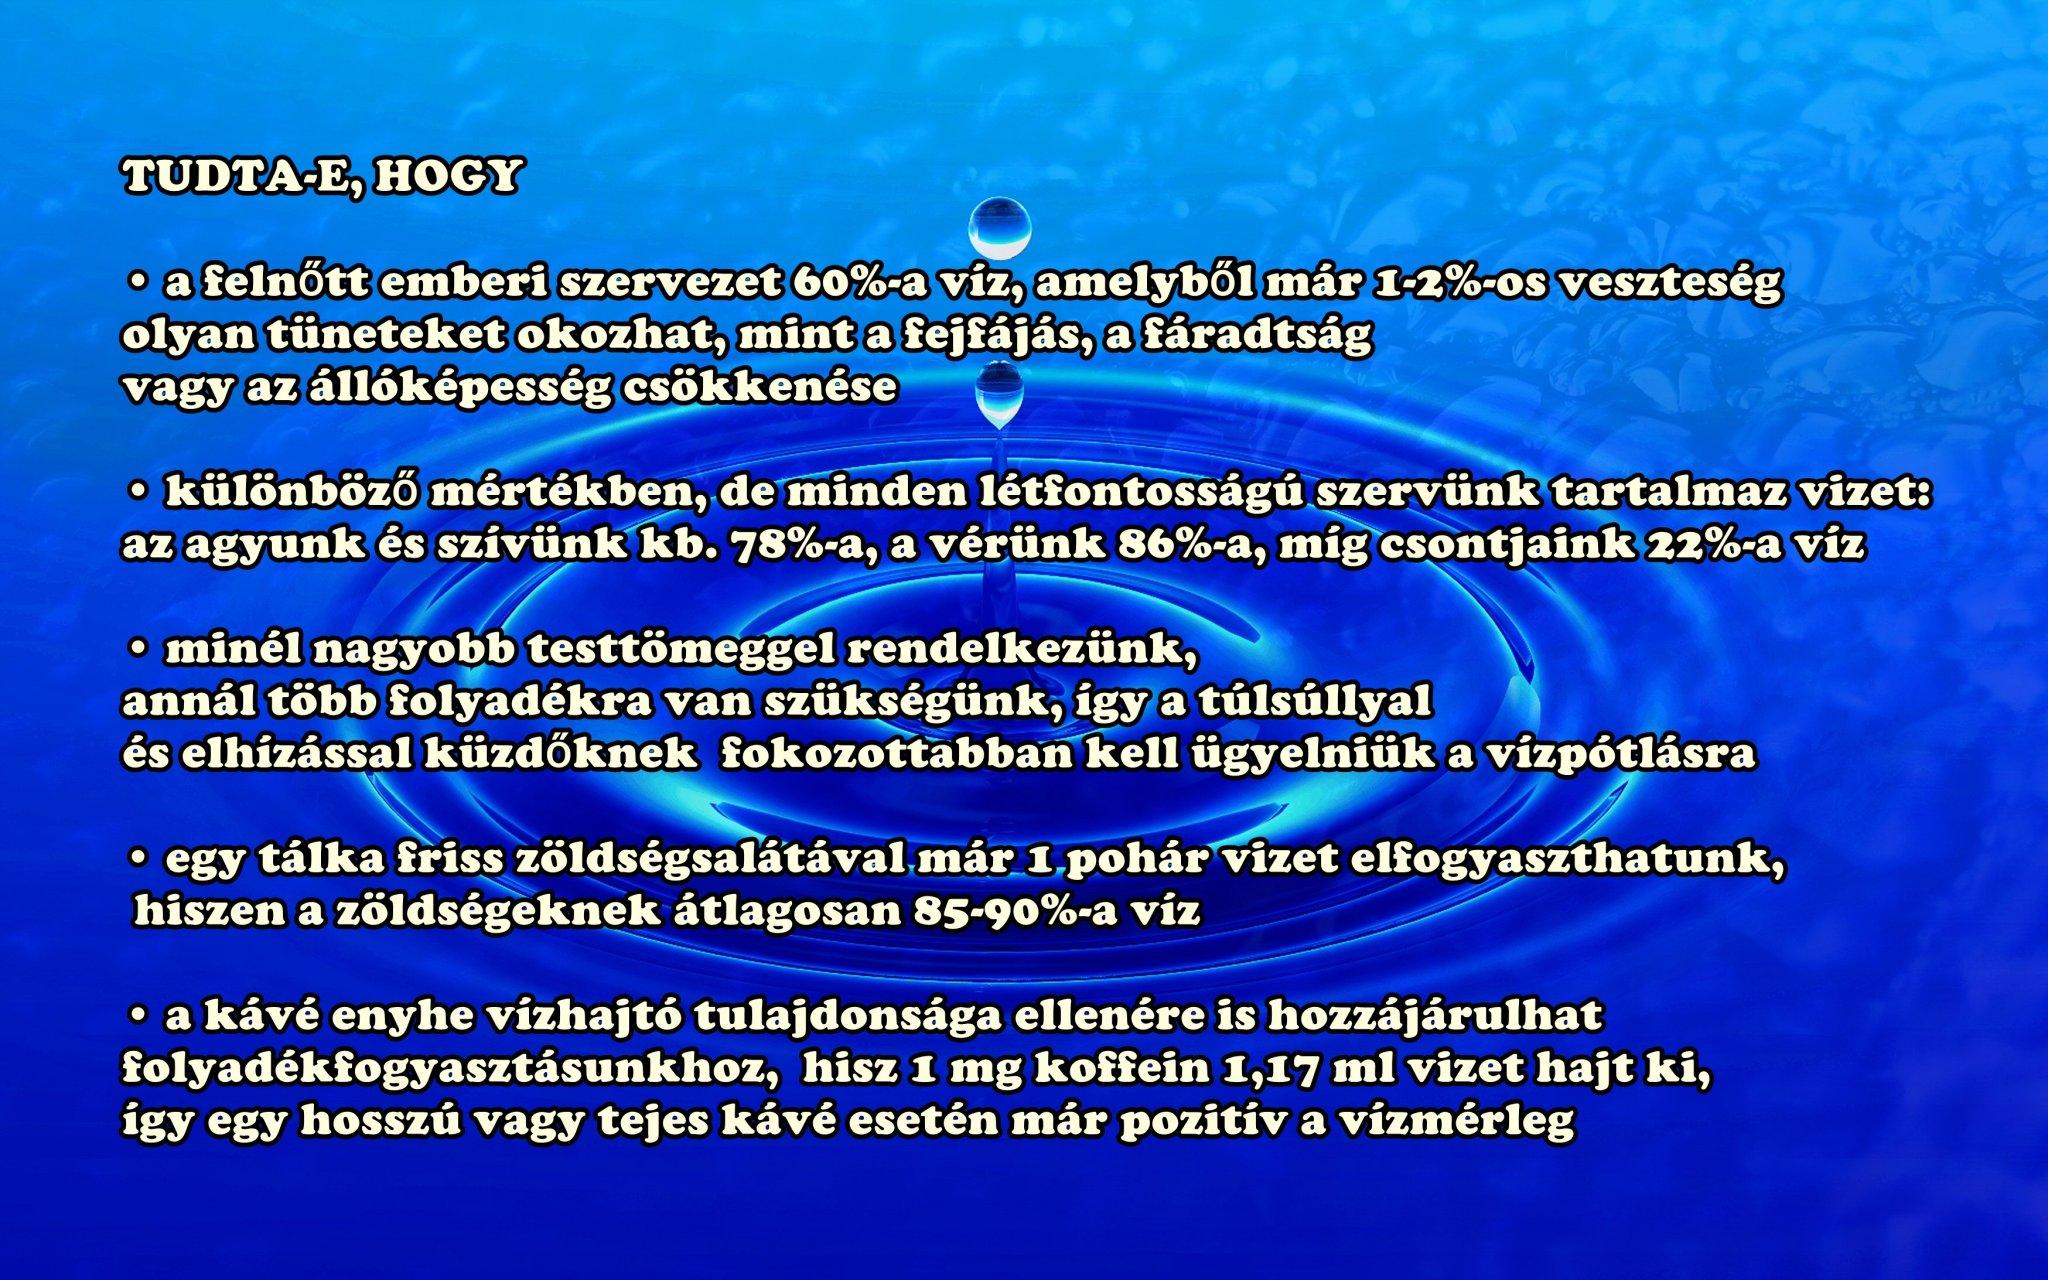 Magas vérnyomás | Dr. Tiszta Víkolibrikonyv.hu